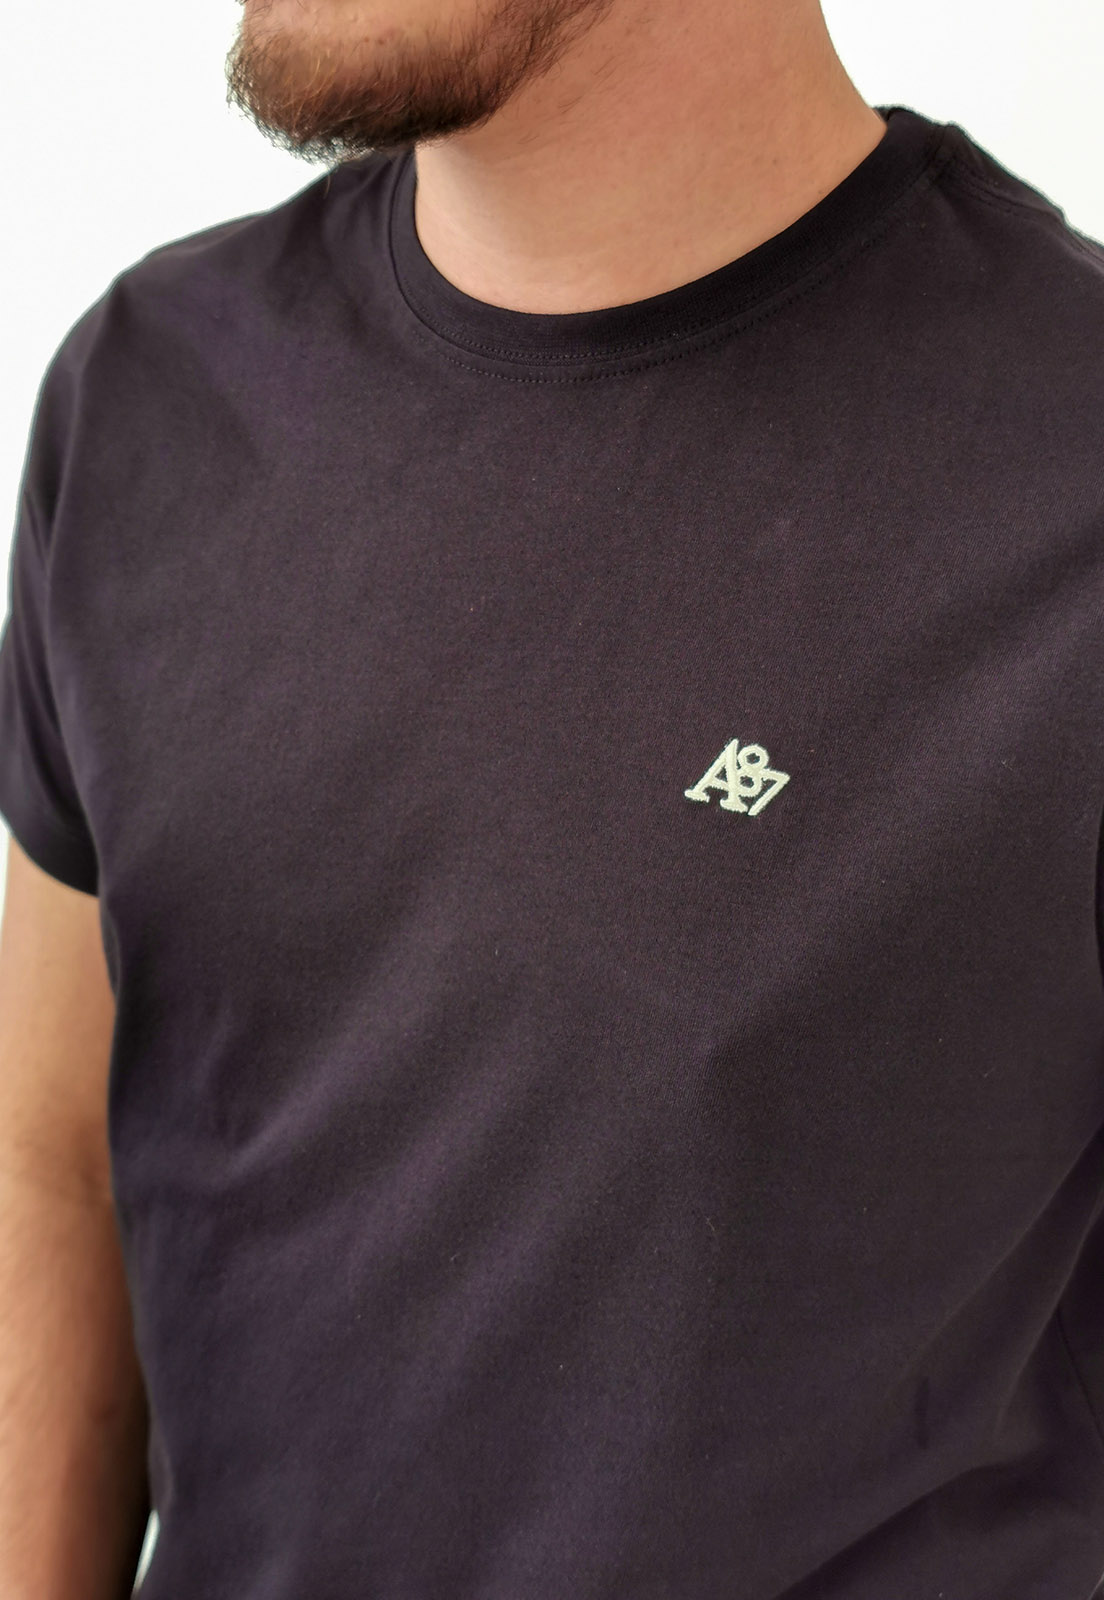 Camiseta Aéropostale Básica Preto Plus Size